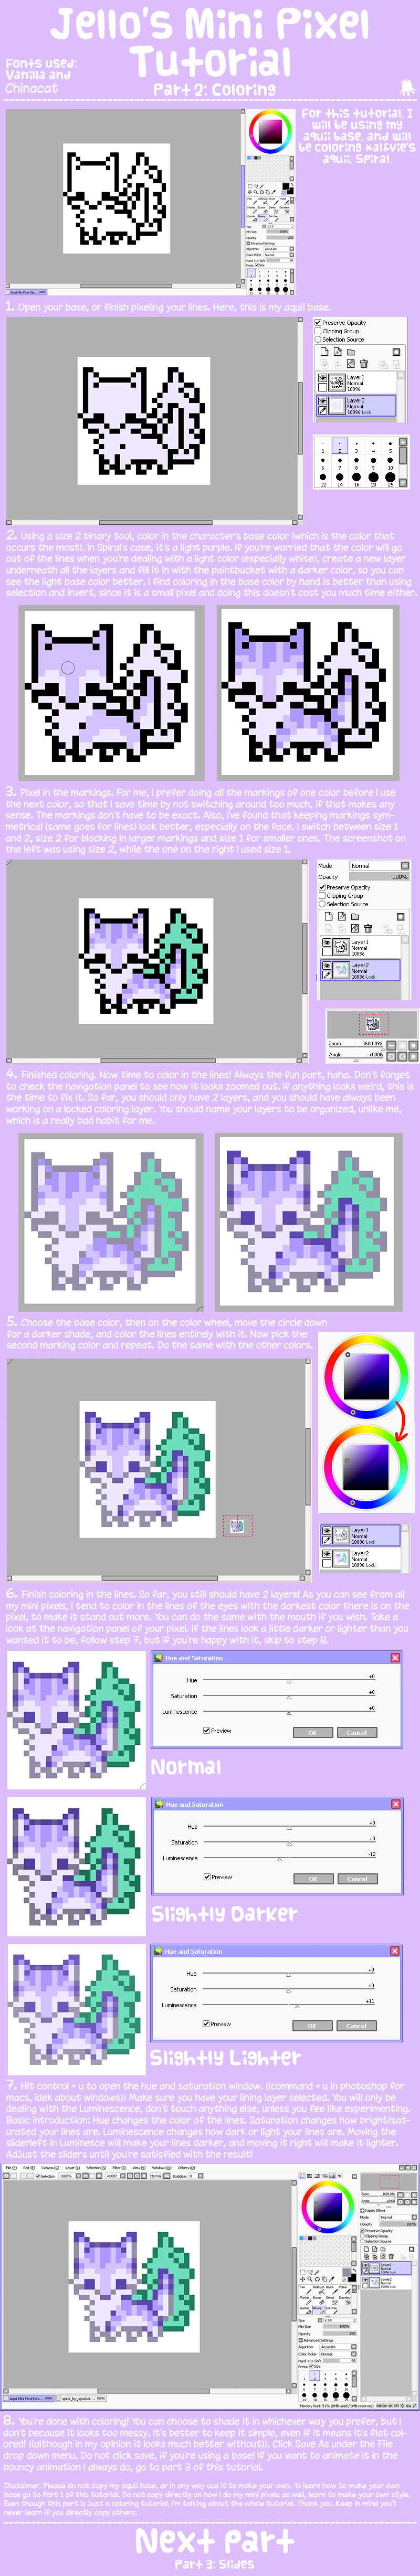 Mini Pixels Part 2 by jennawing